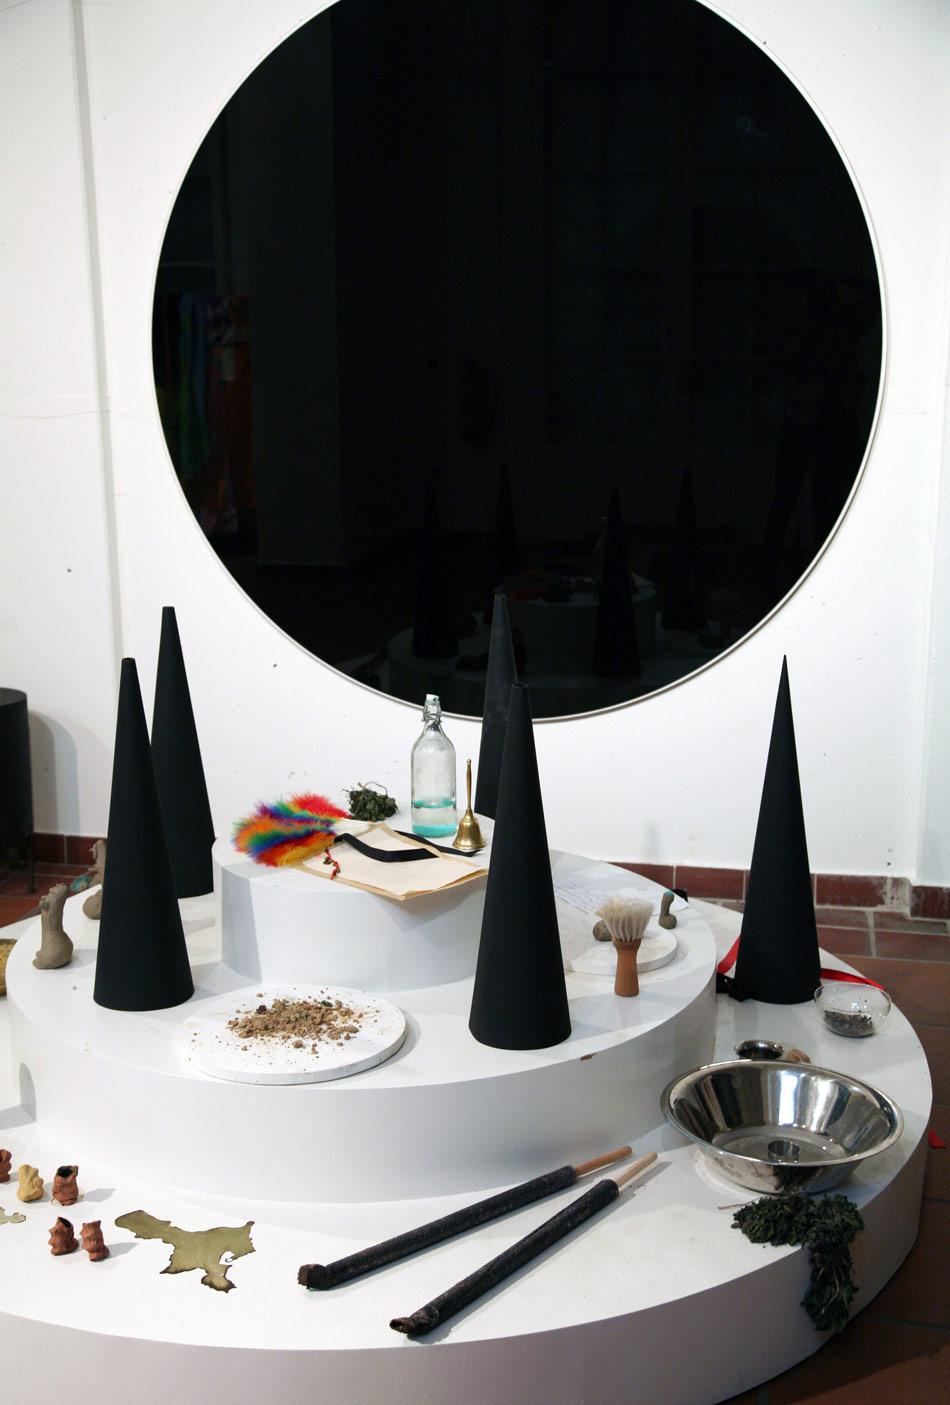 J&K, ter Heijne, Ray, Under Her Spell, installation view, Galerie im Körnerpark, photos: Mathilde ter Heijne